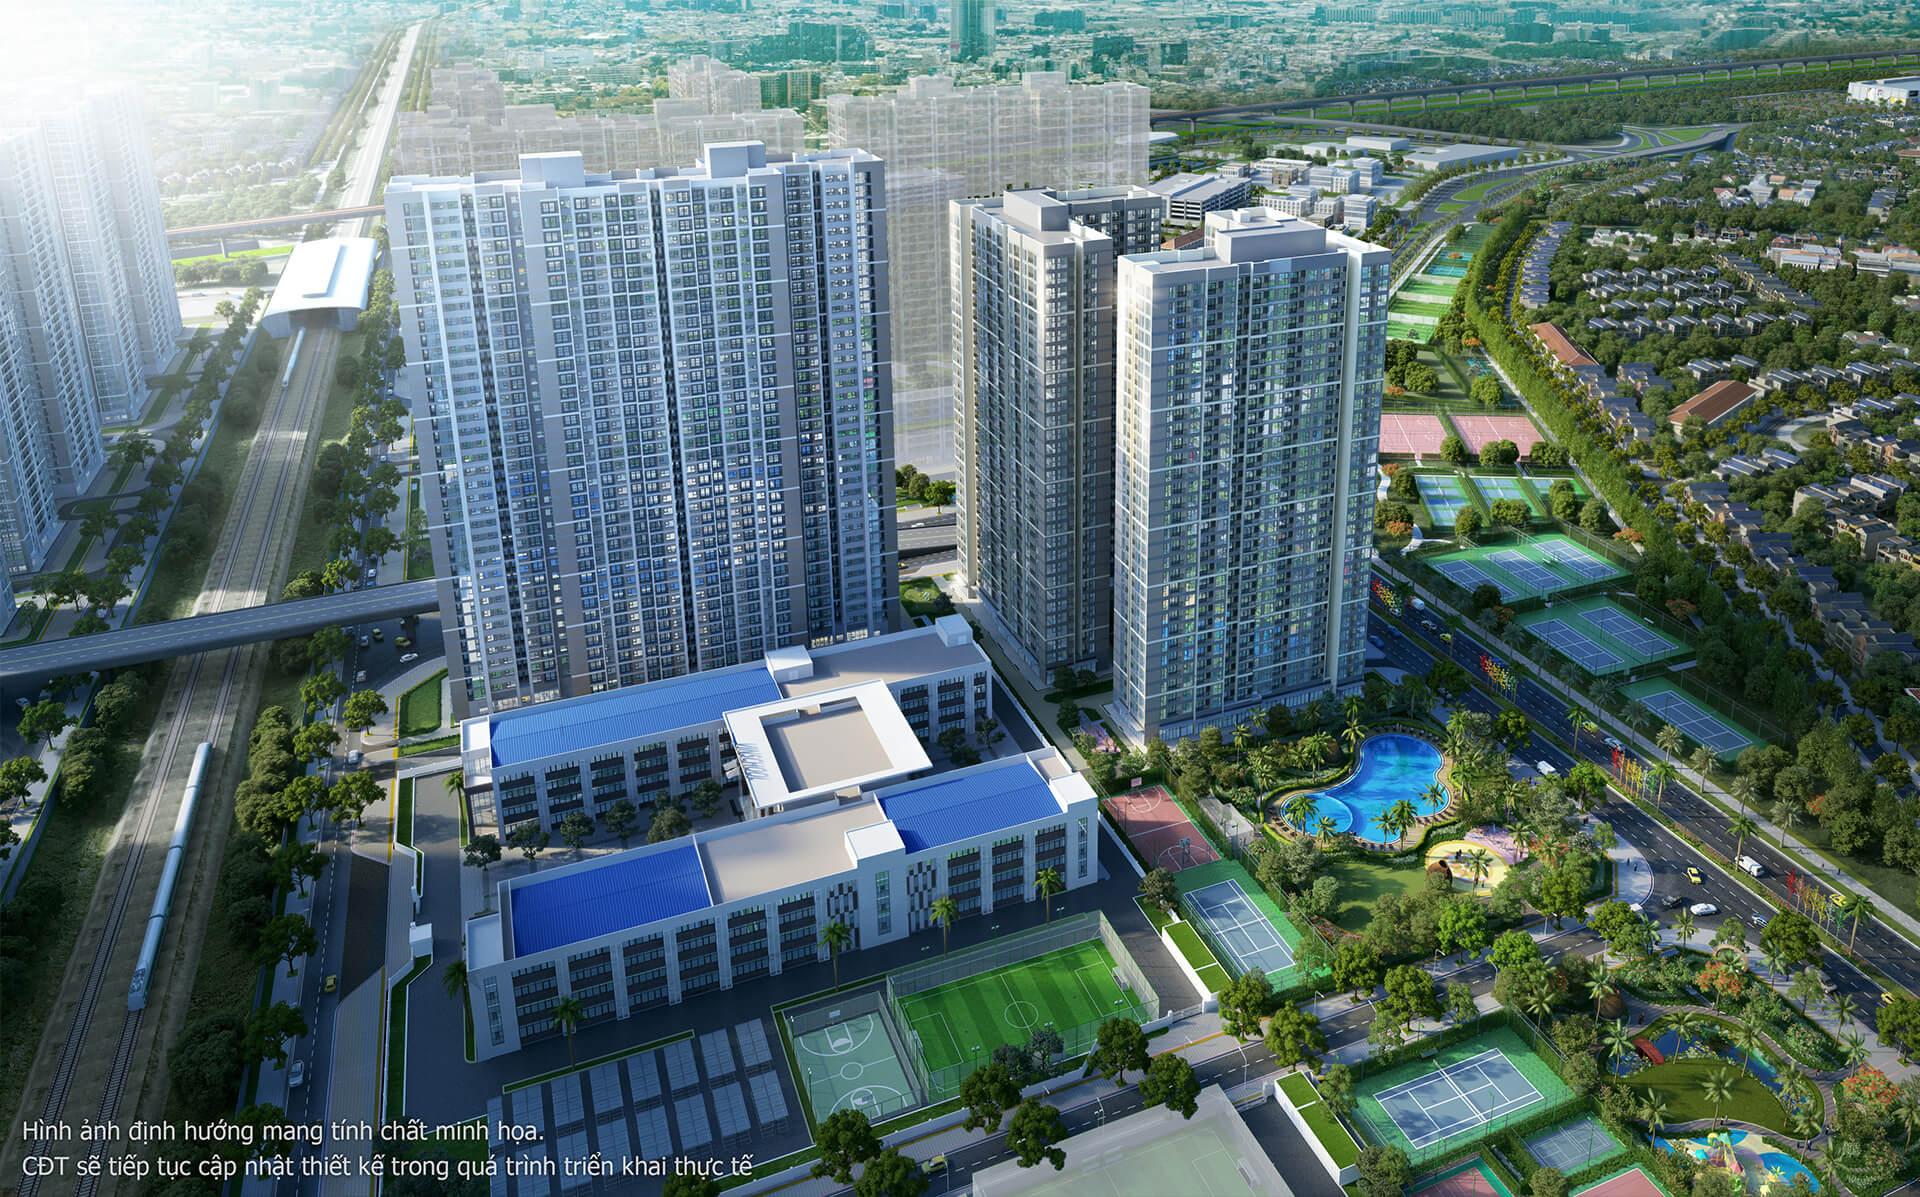 hinh anh Tien ich Vinhomes Smart City Song gan thien nhien an yen hanh phuc so 03